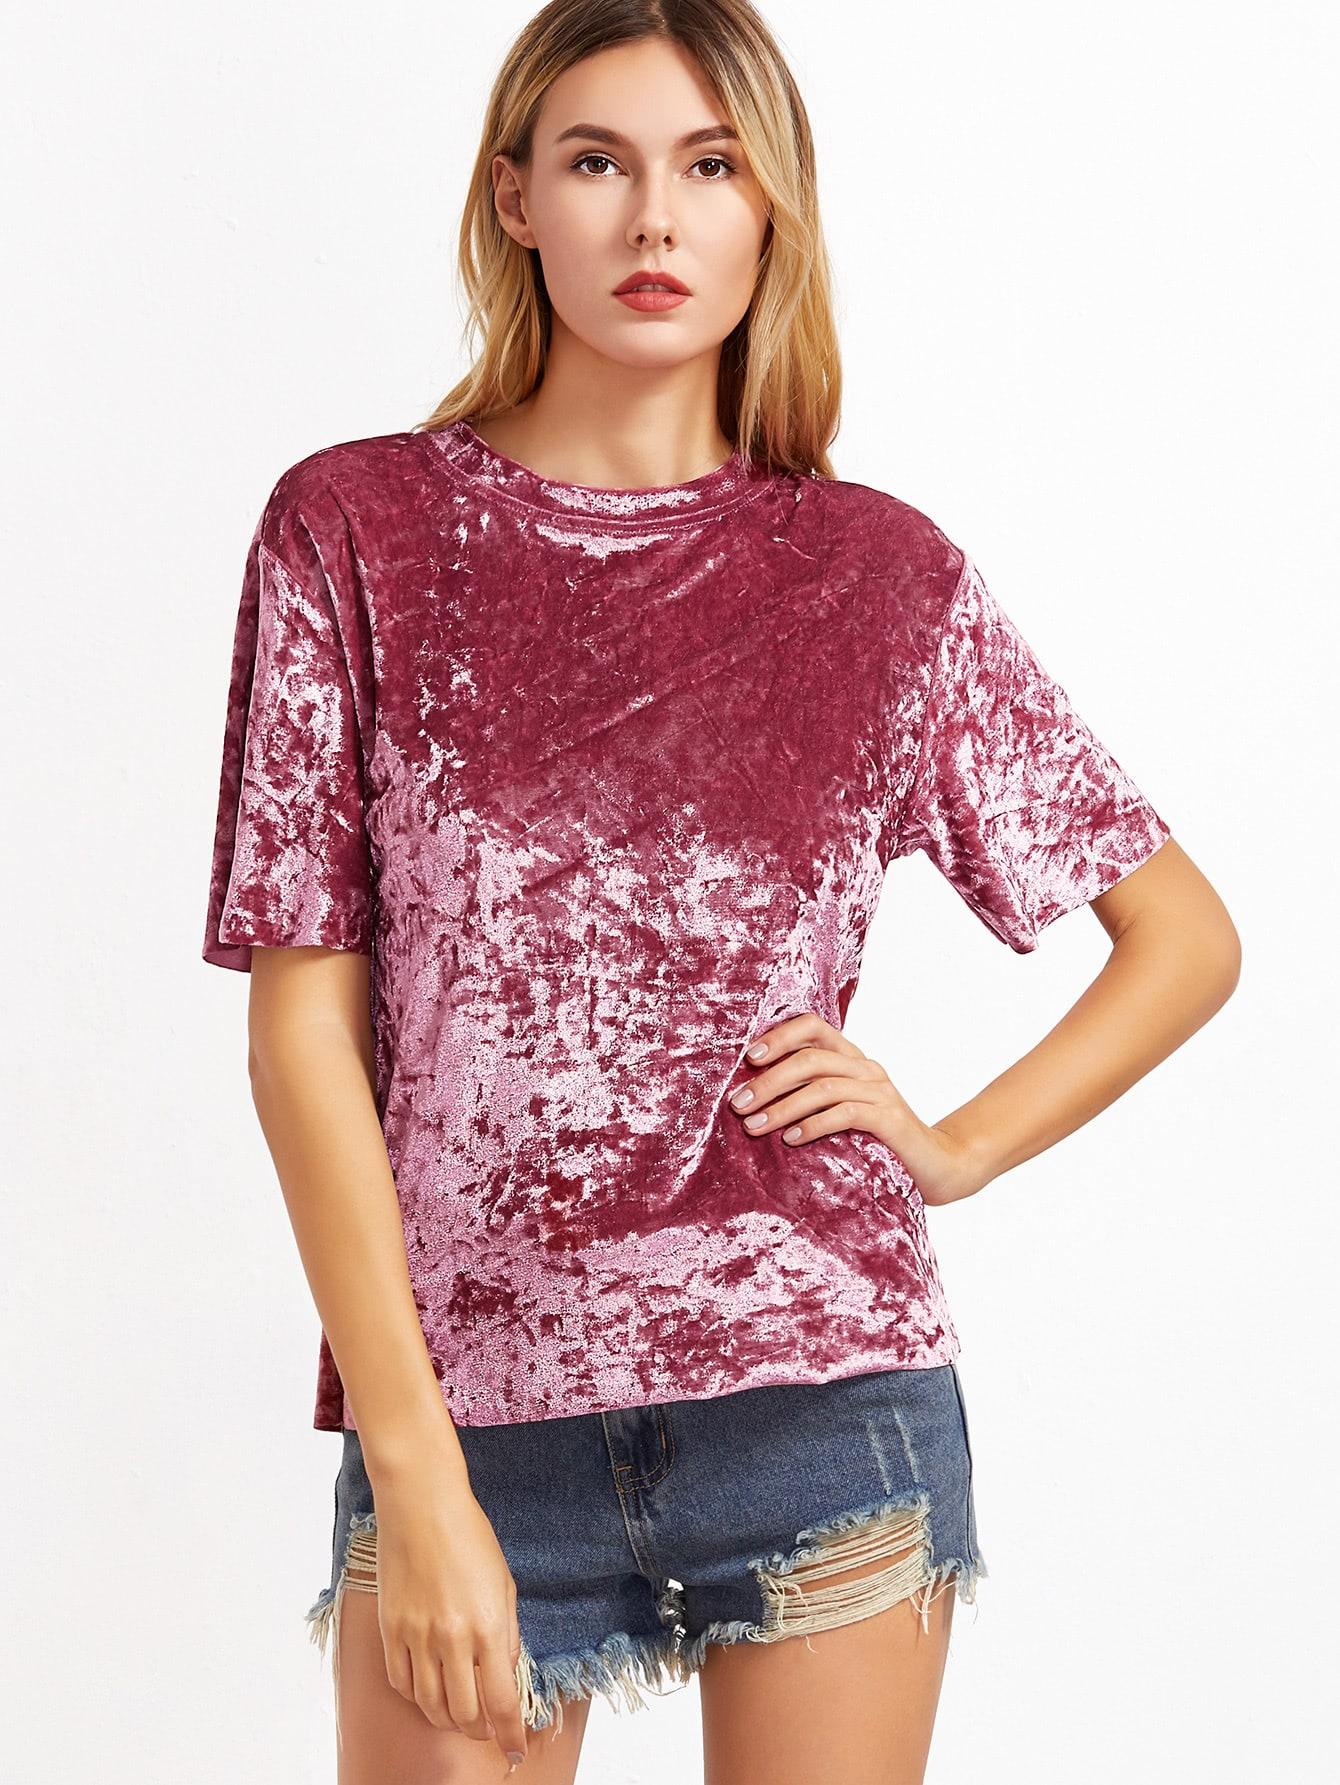 blouse161122701_2